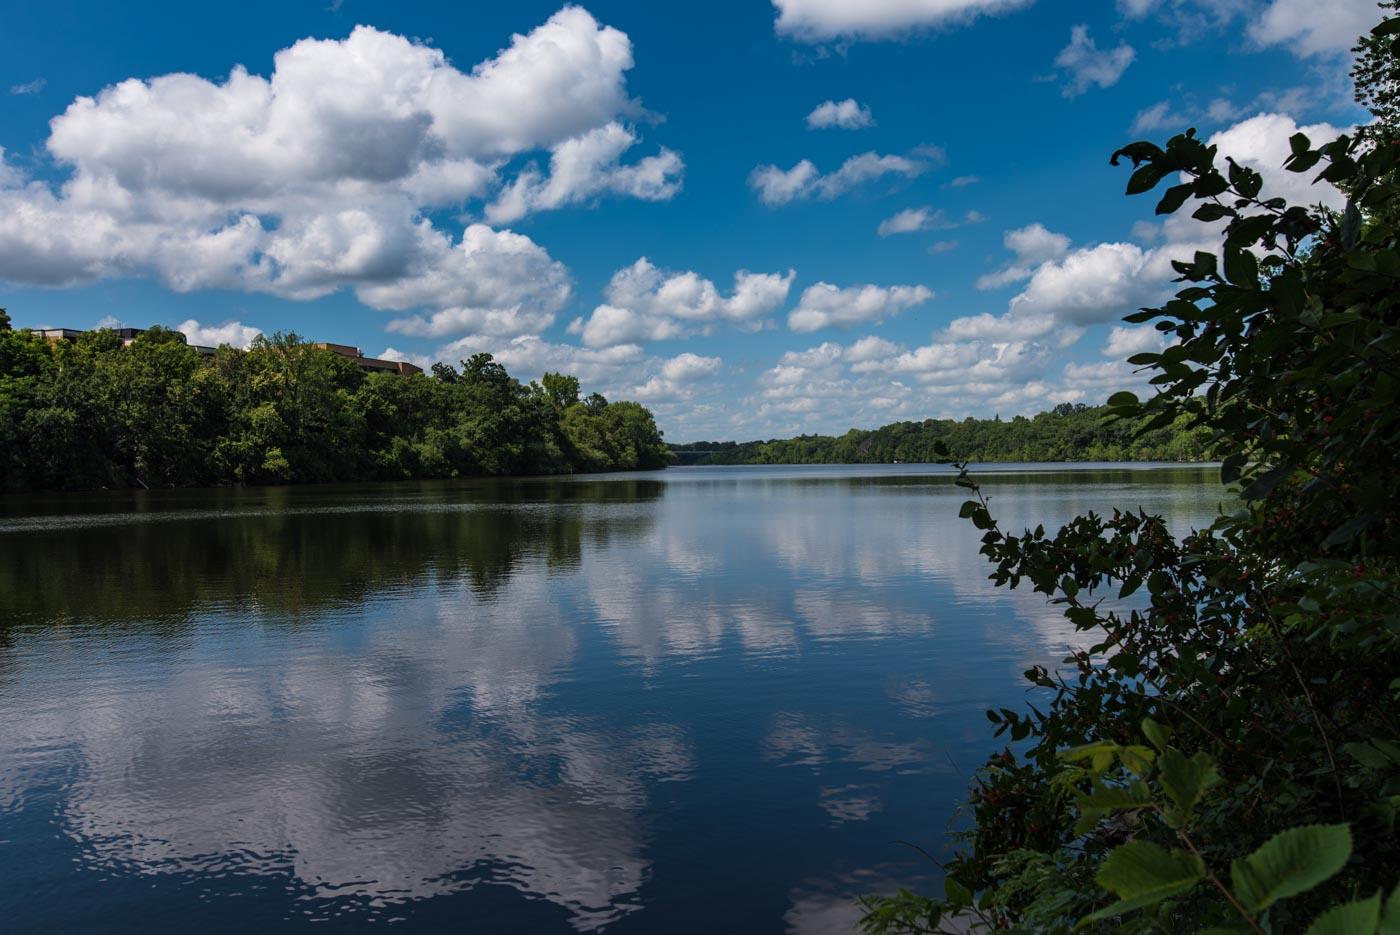 Mississippi River, St Cloud, MN